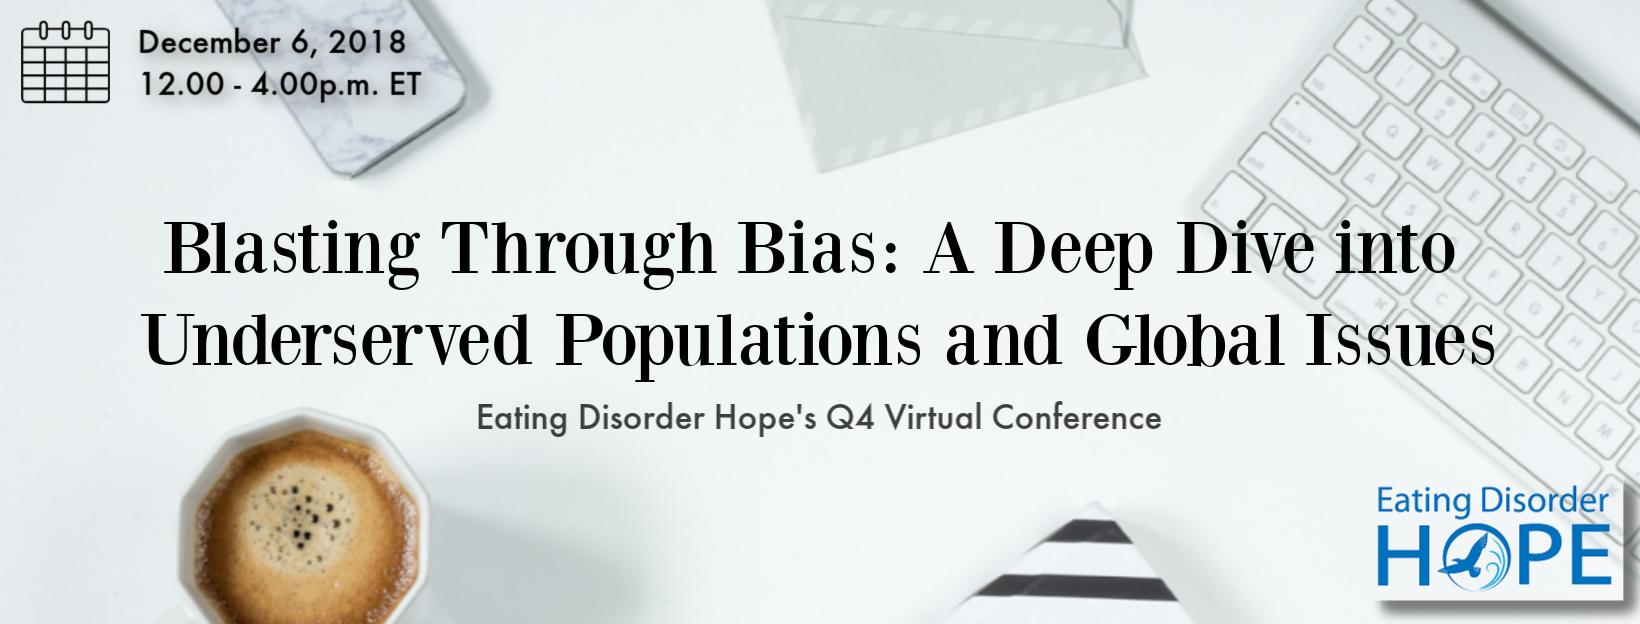 Virtual Conference III Sponsors